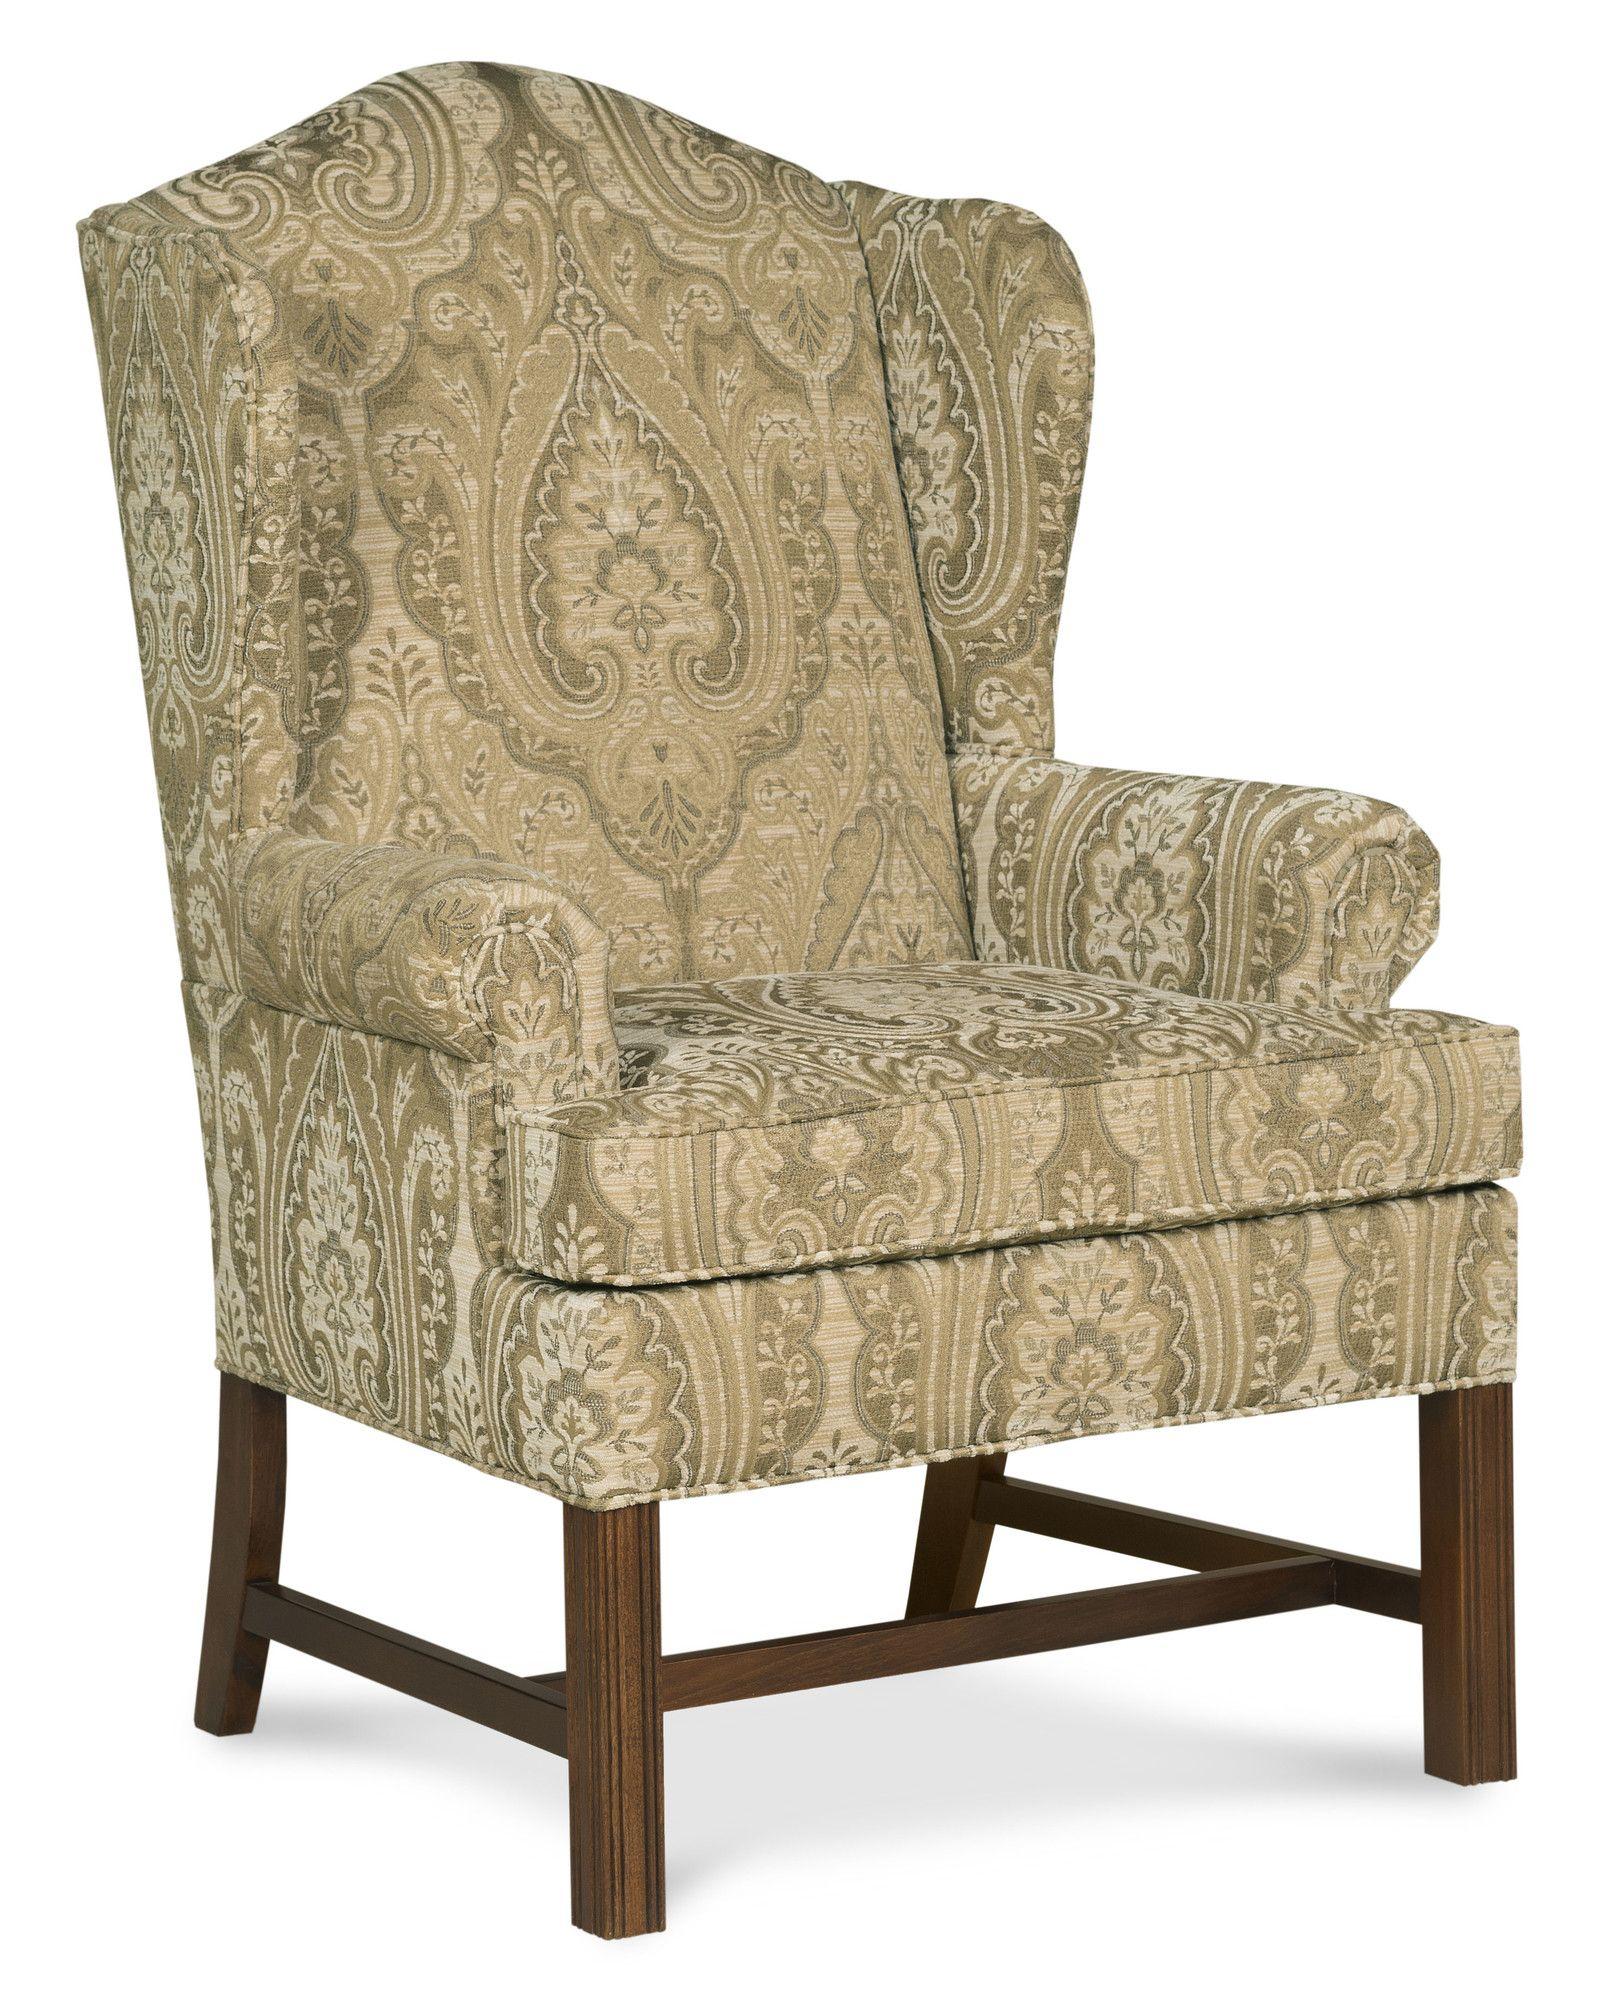 Fairfield Chair Chippendale Wingback Chair U0026 Reviews | Wayfair